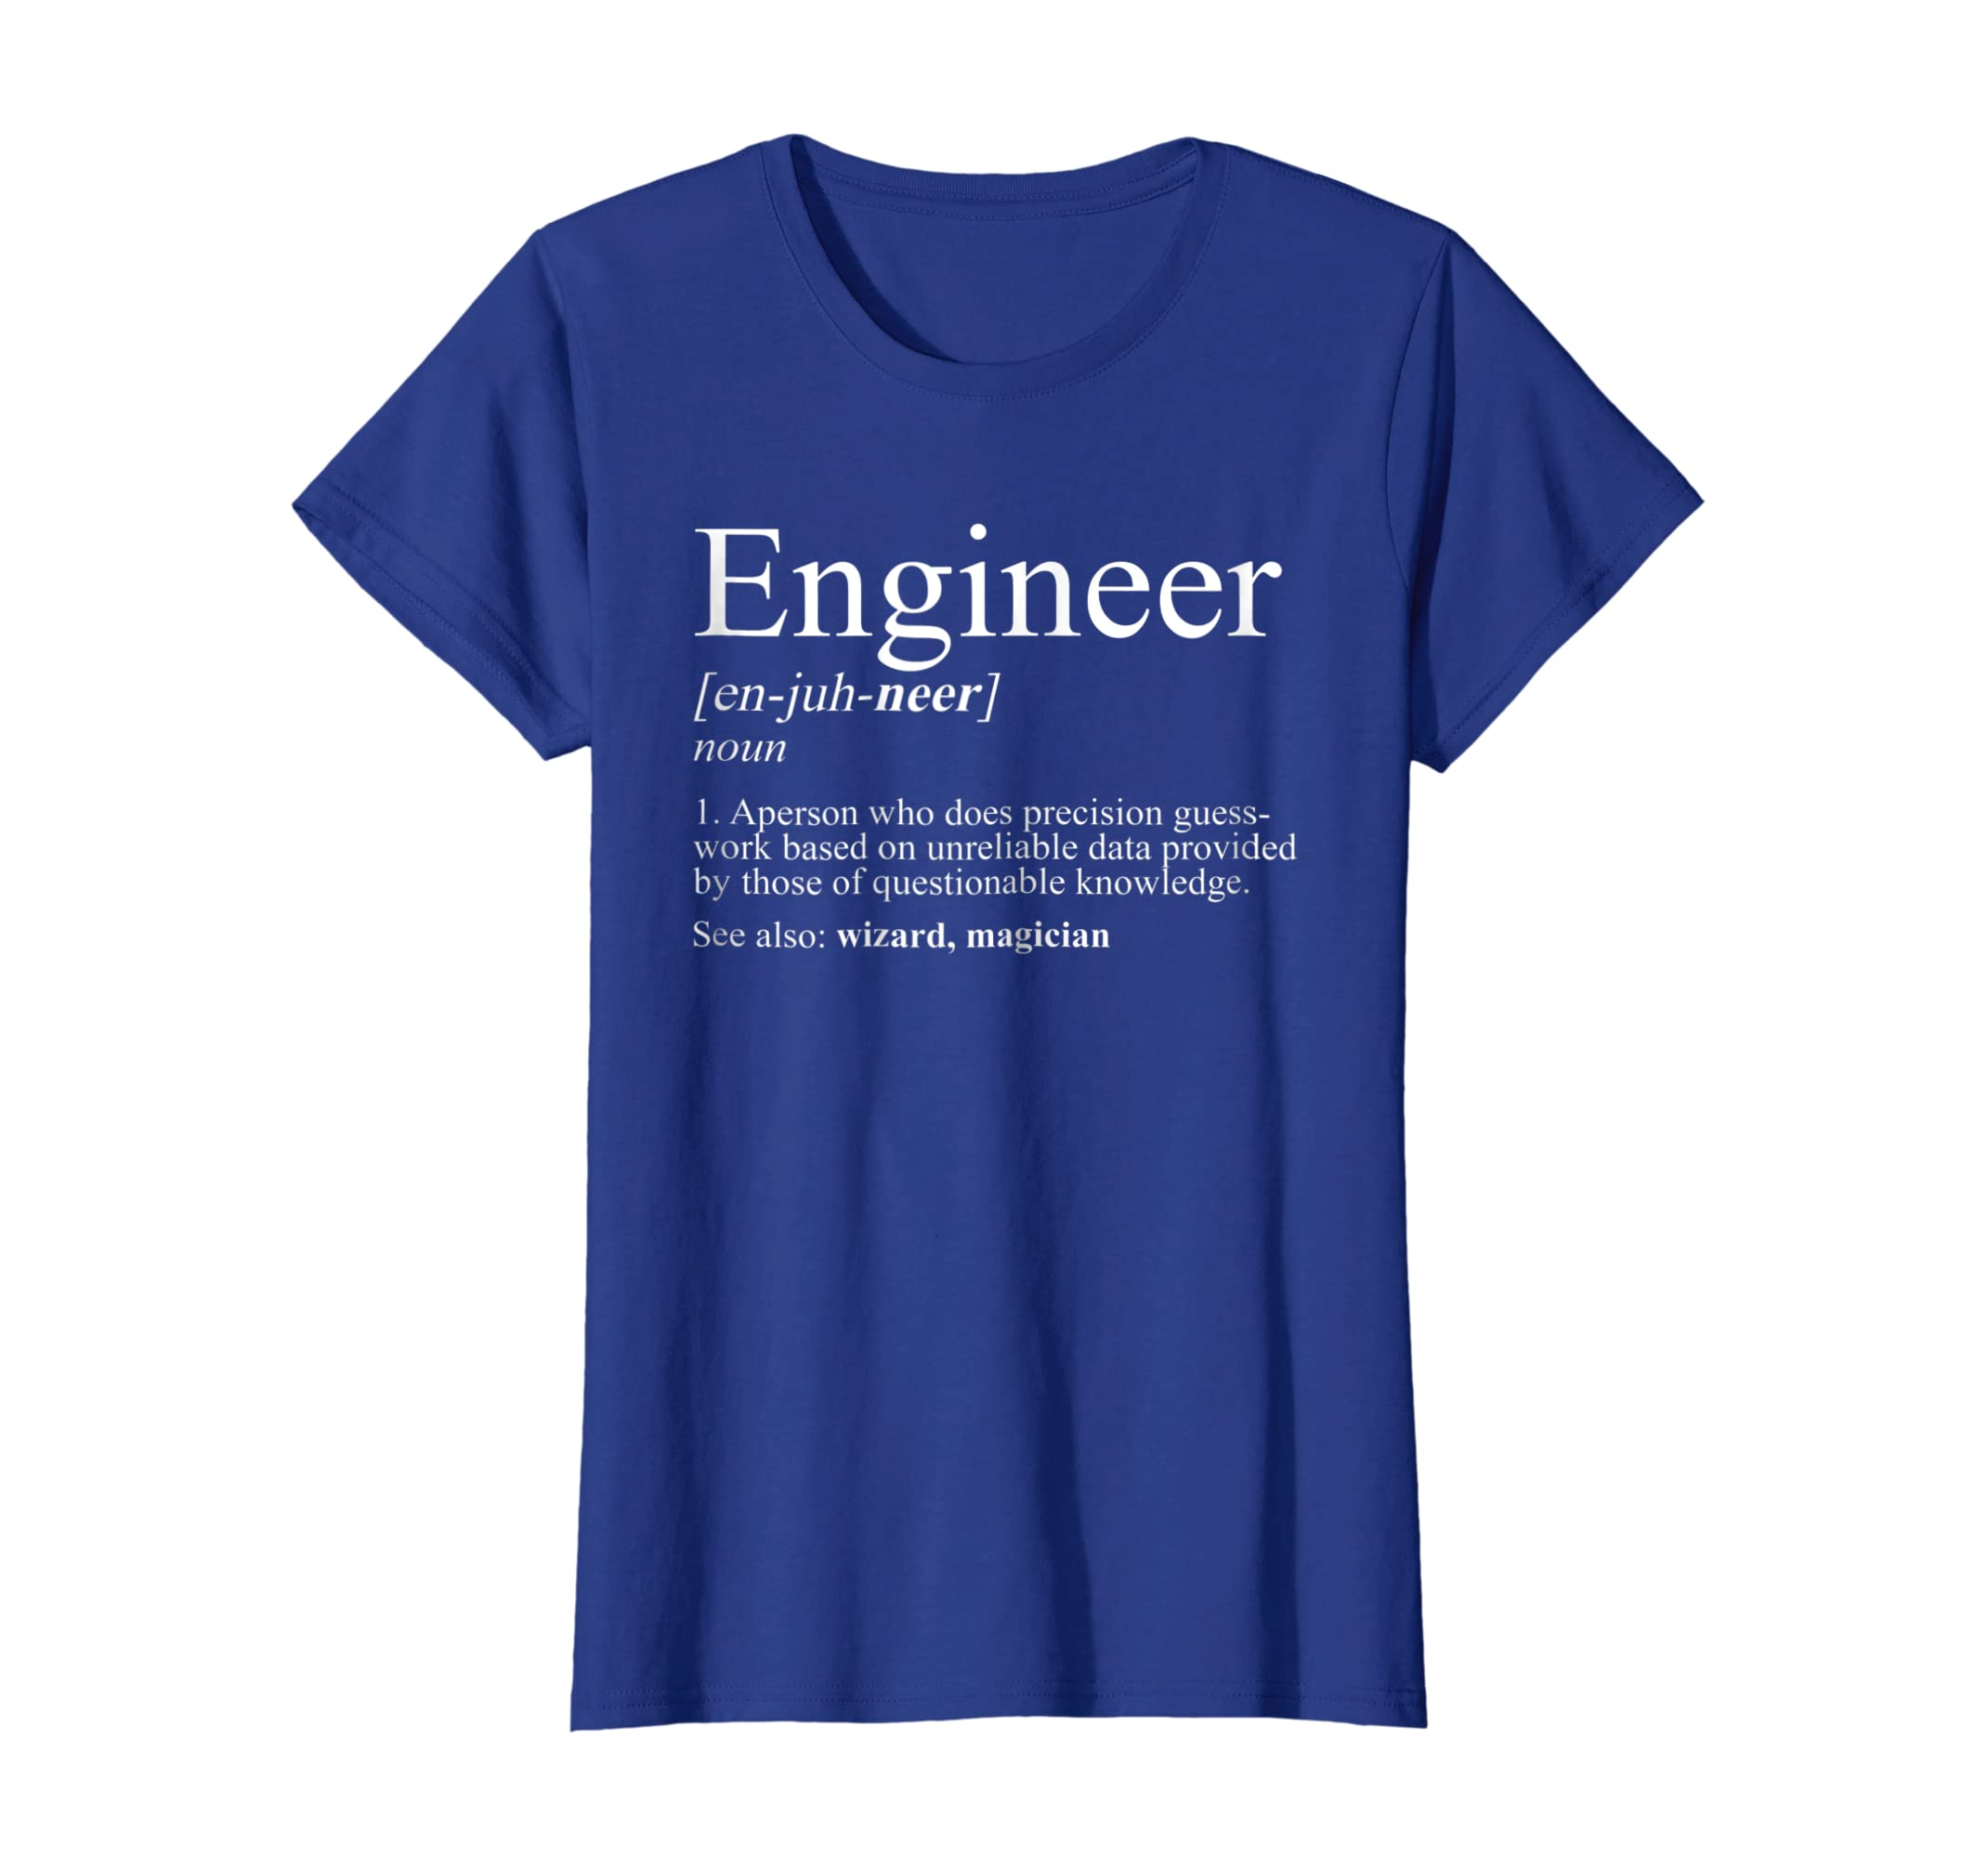 9b6b75d1f9 Amazon.com: Engineer Definition T Shirt, Funny Engineering Gift: Clothing